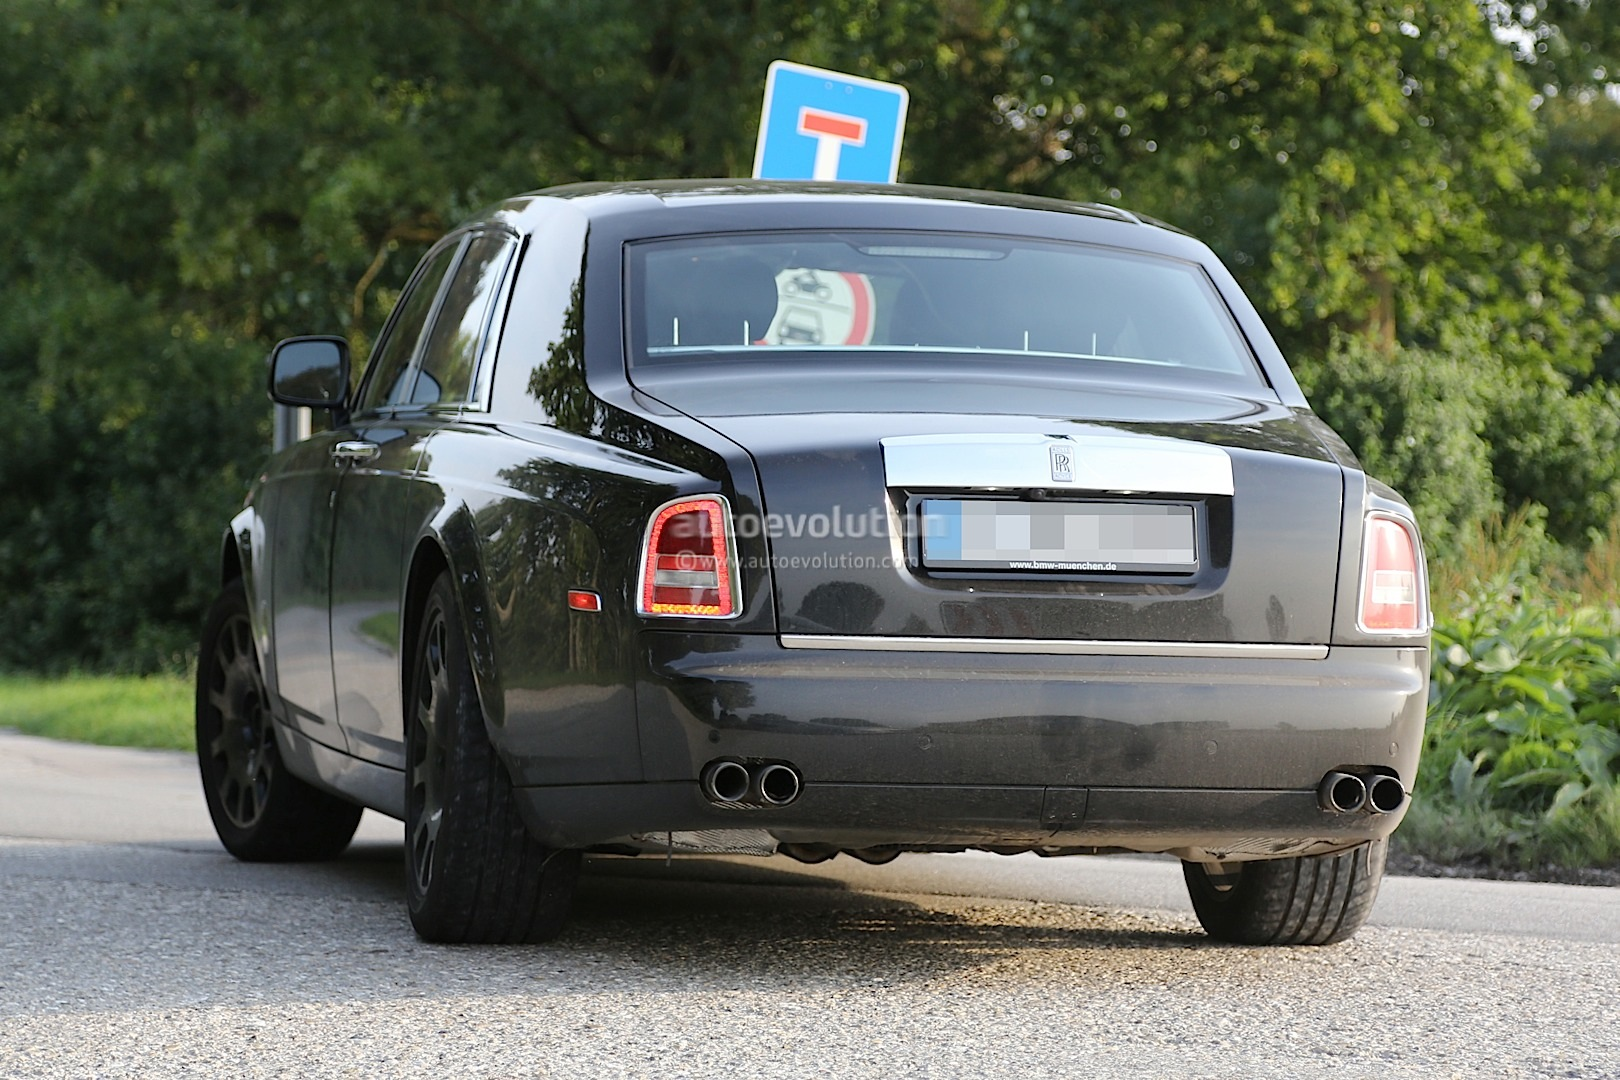 Next Generation Rolls Royce Phantom Interior Spied For The